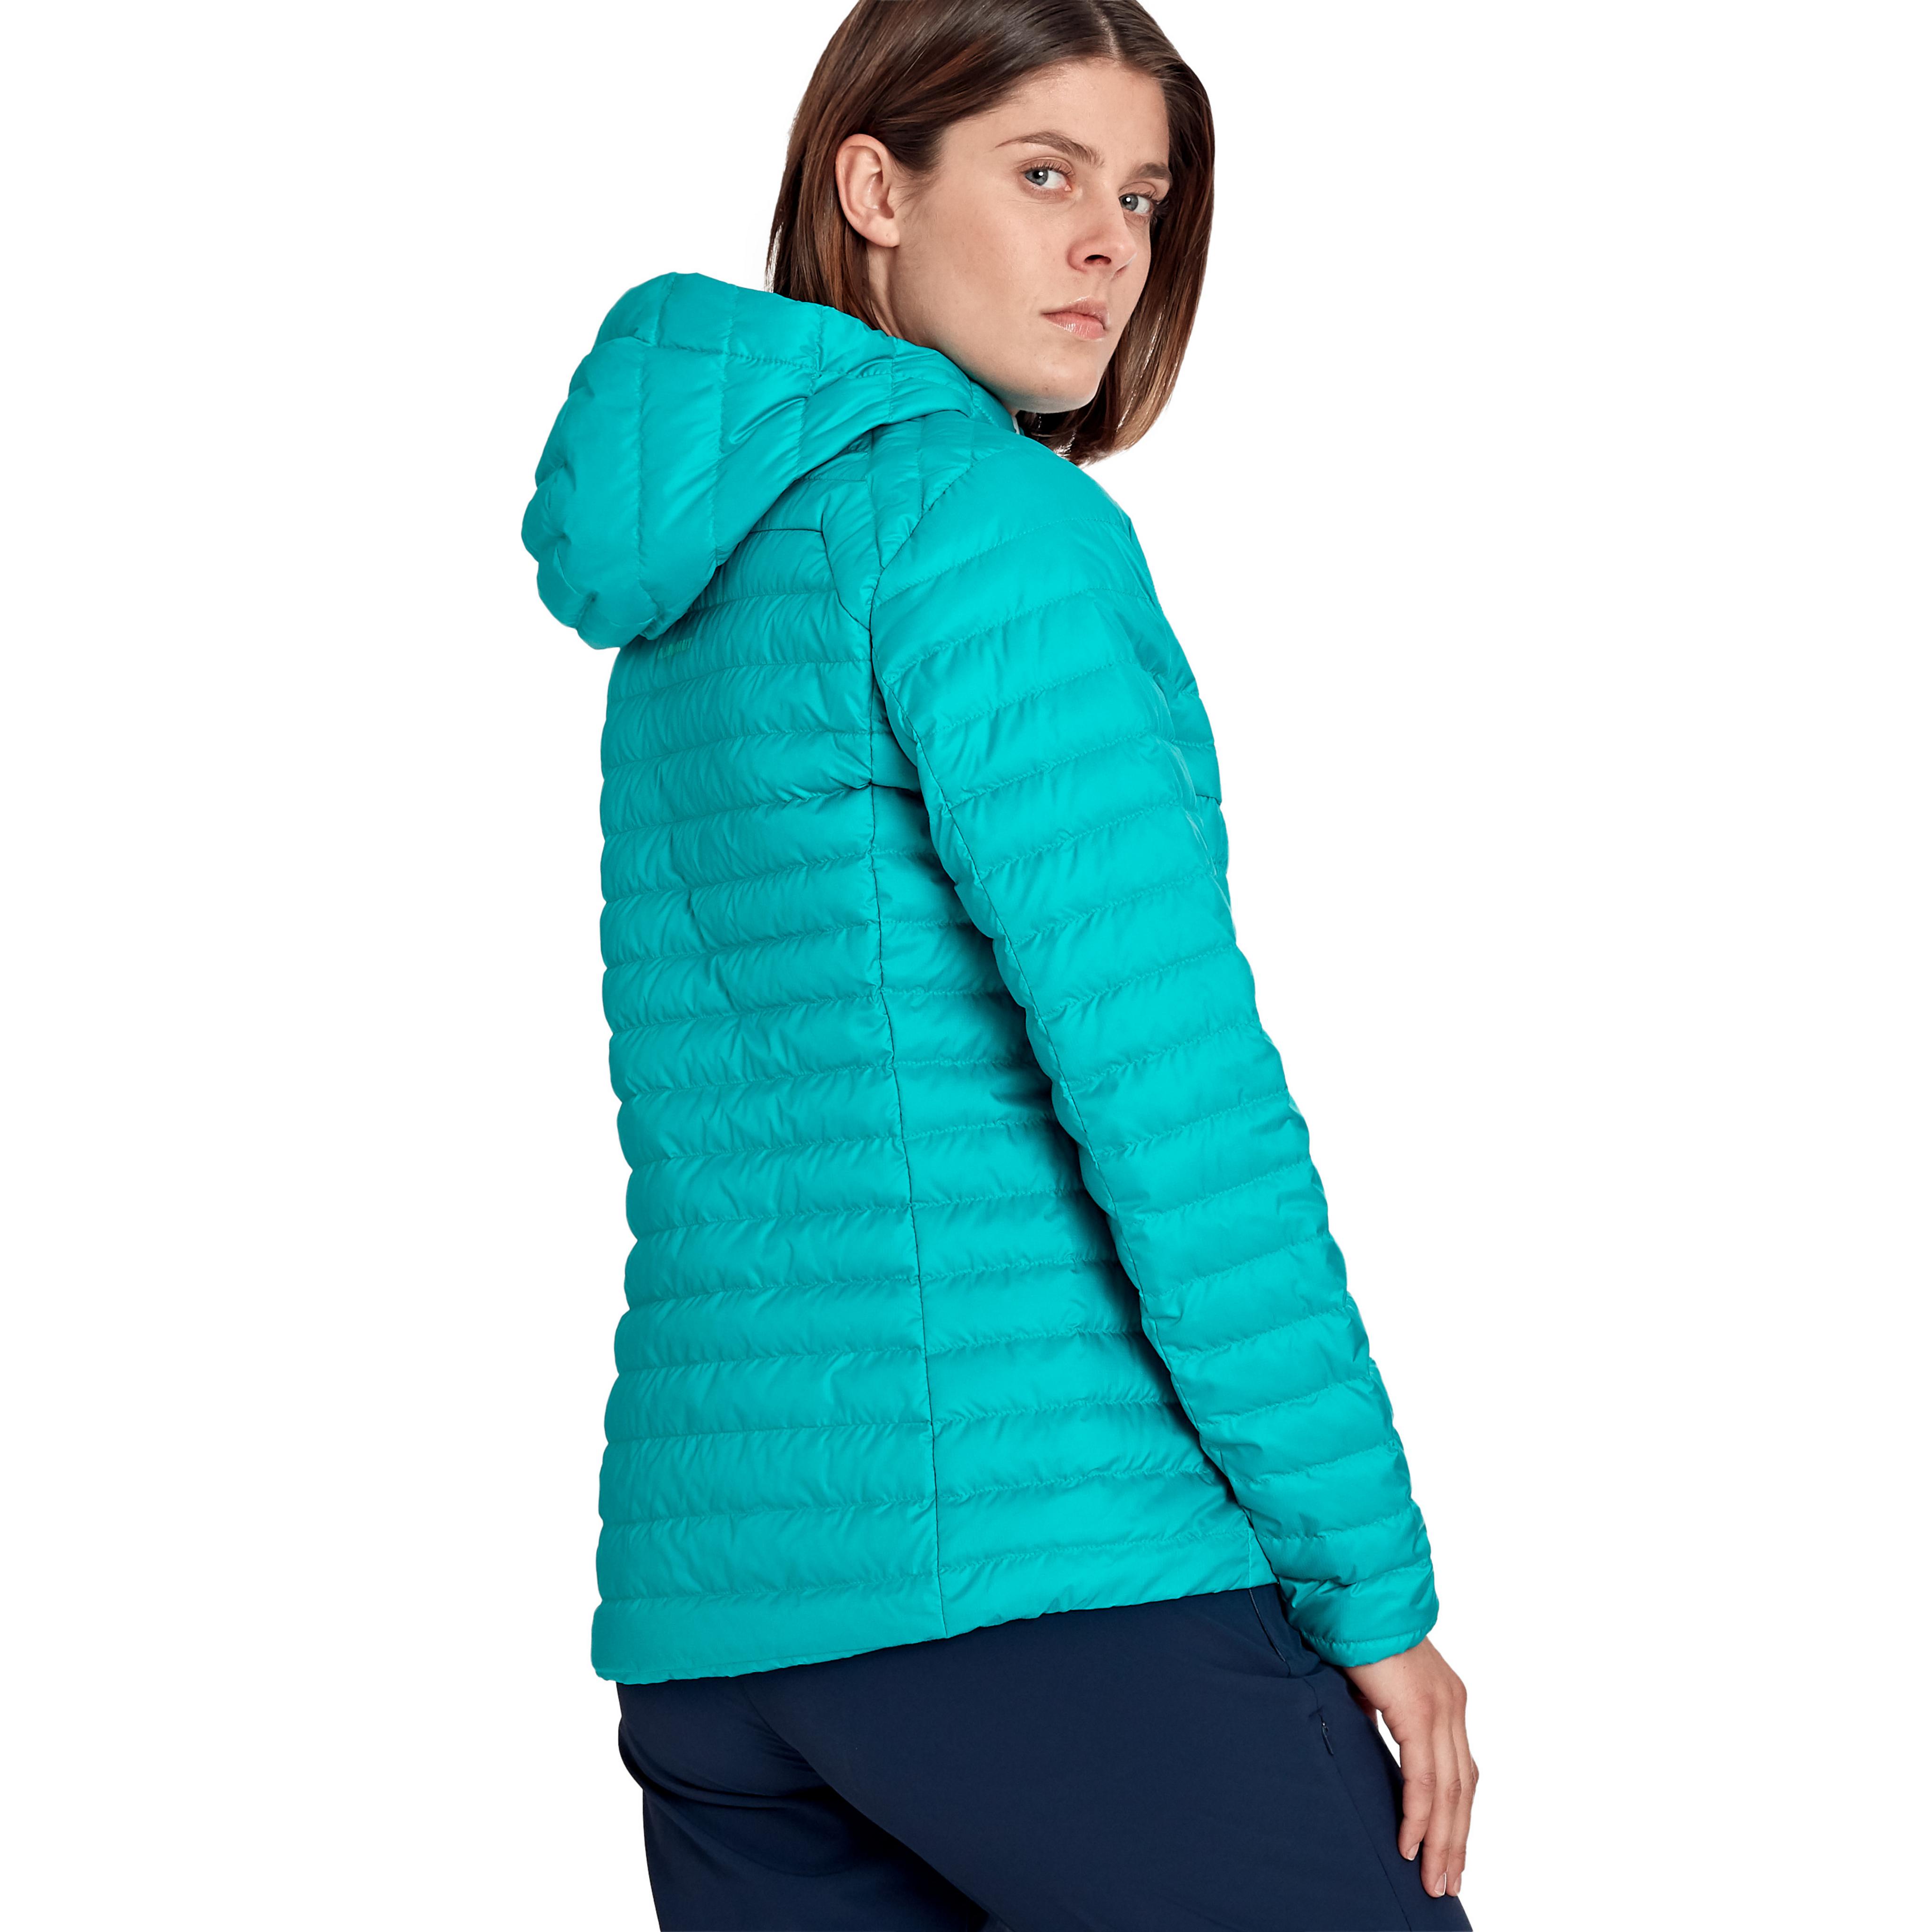 Convey IN Hooded Jacket Women thumbnail